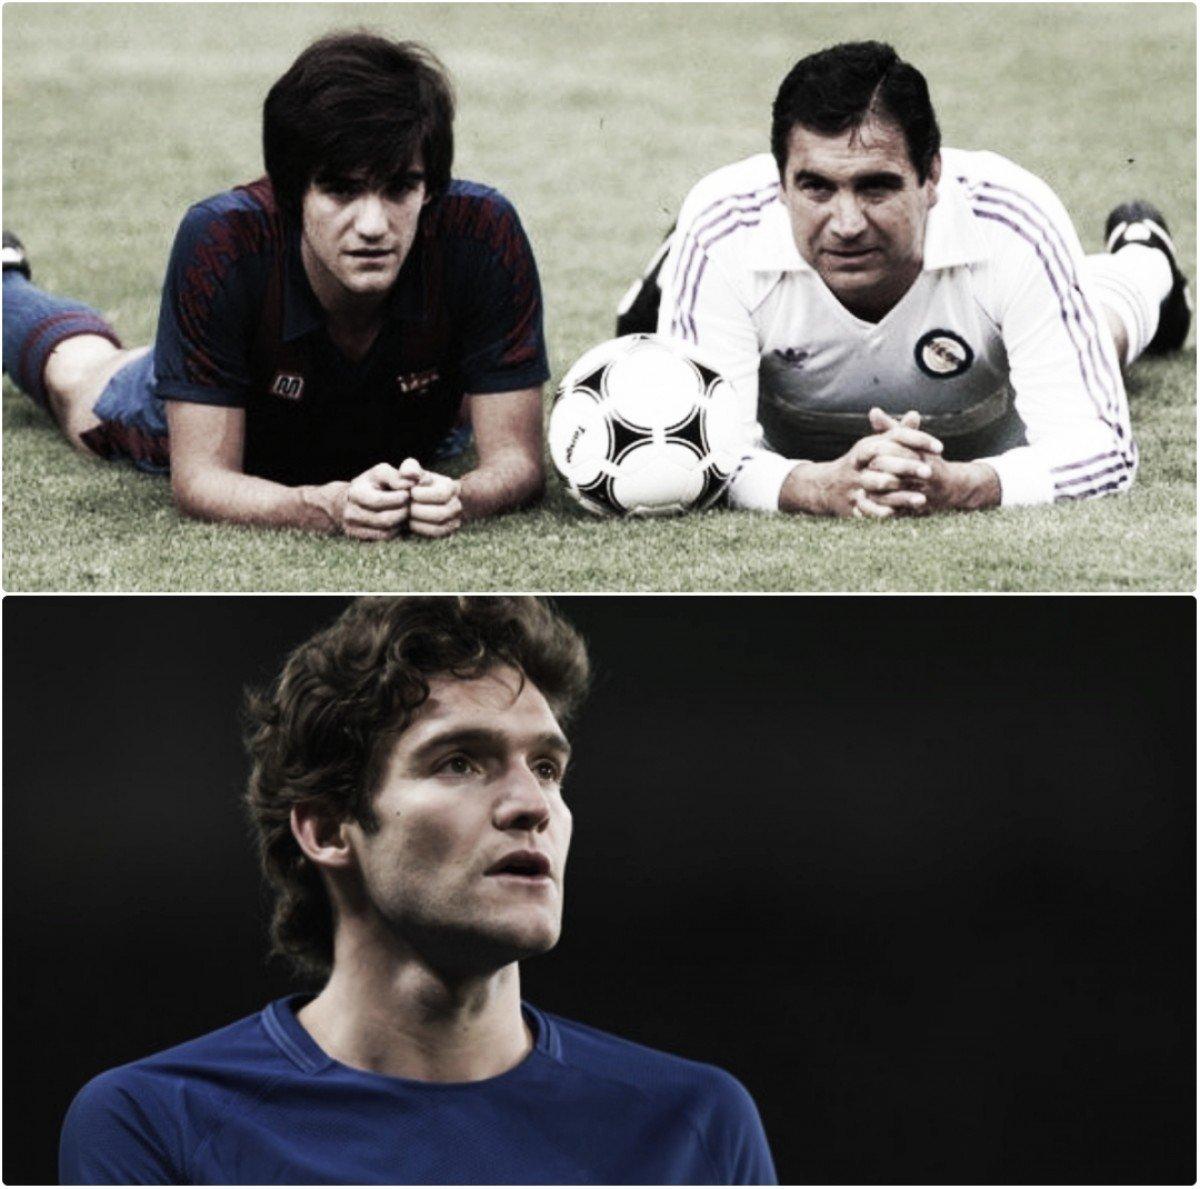 La familia Alonso, pasado, presente y futuro